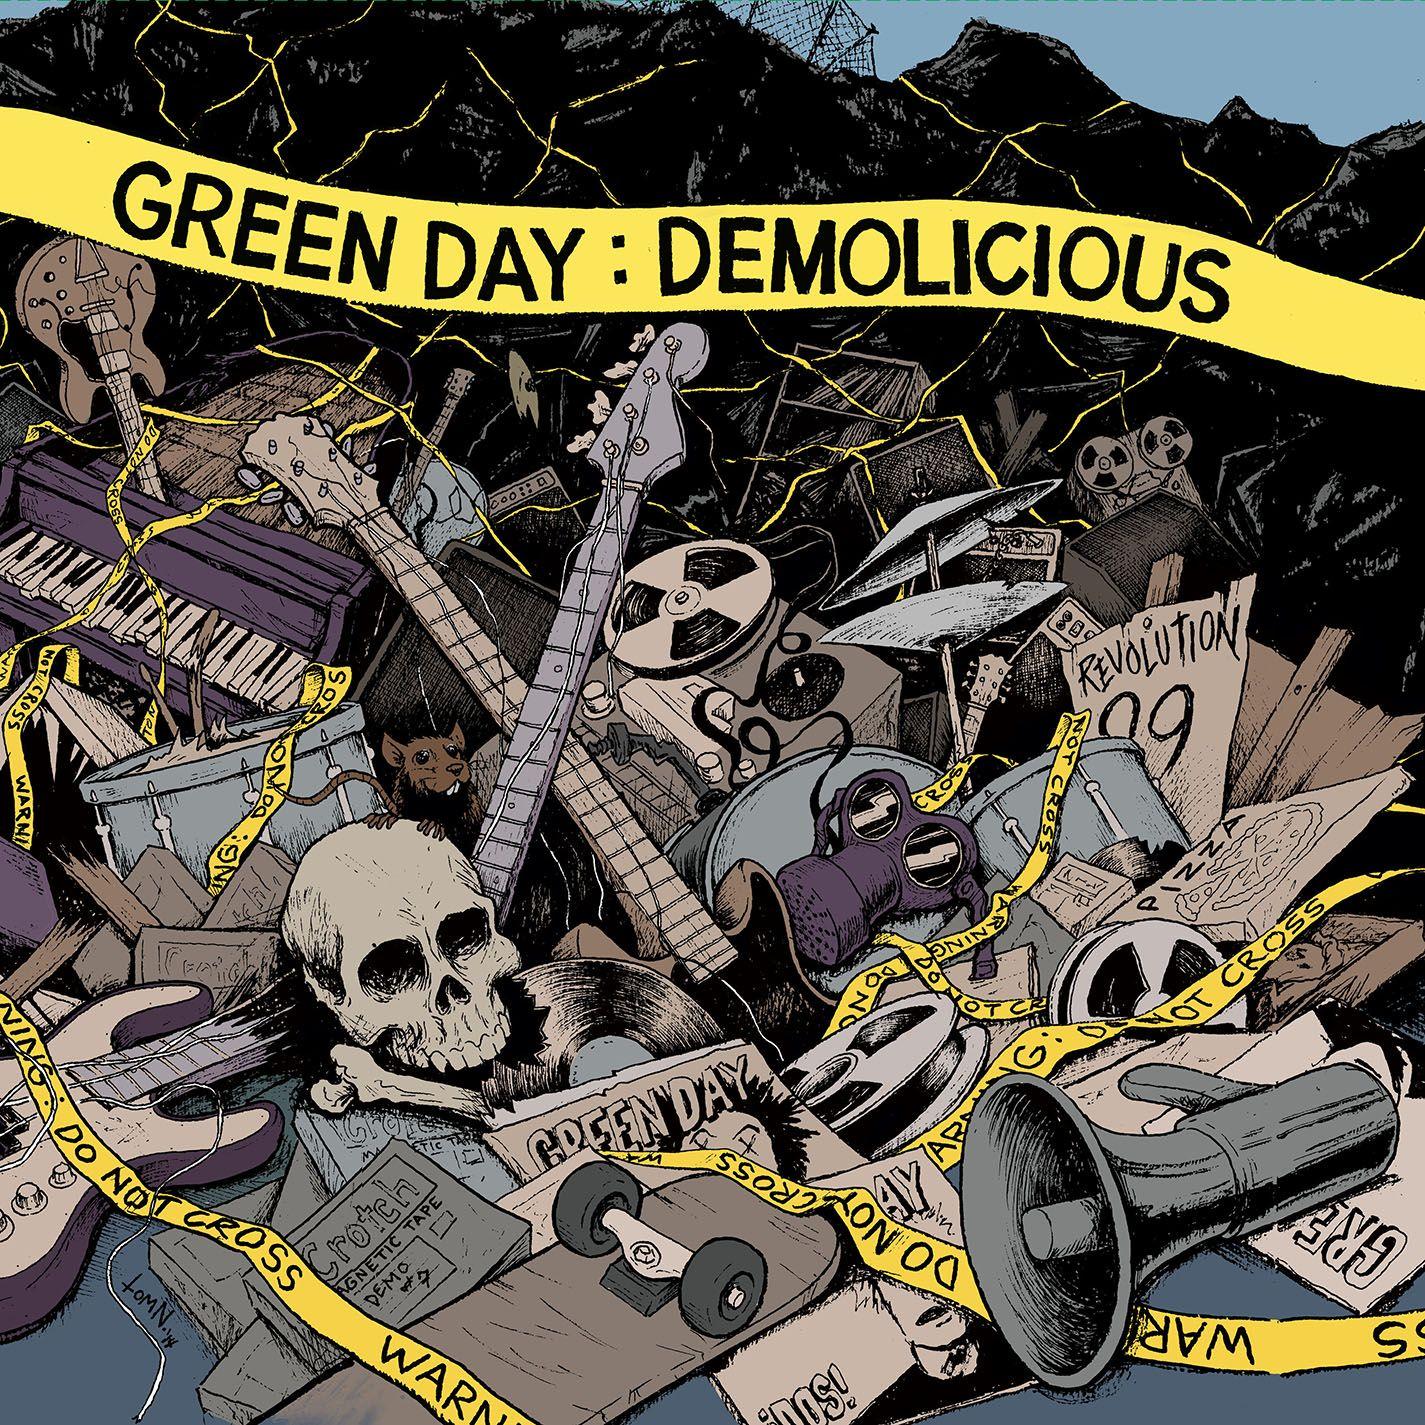 Green Day - Demolicious album cover